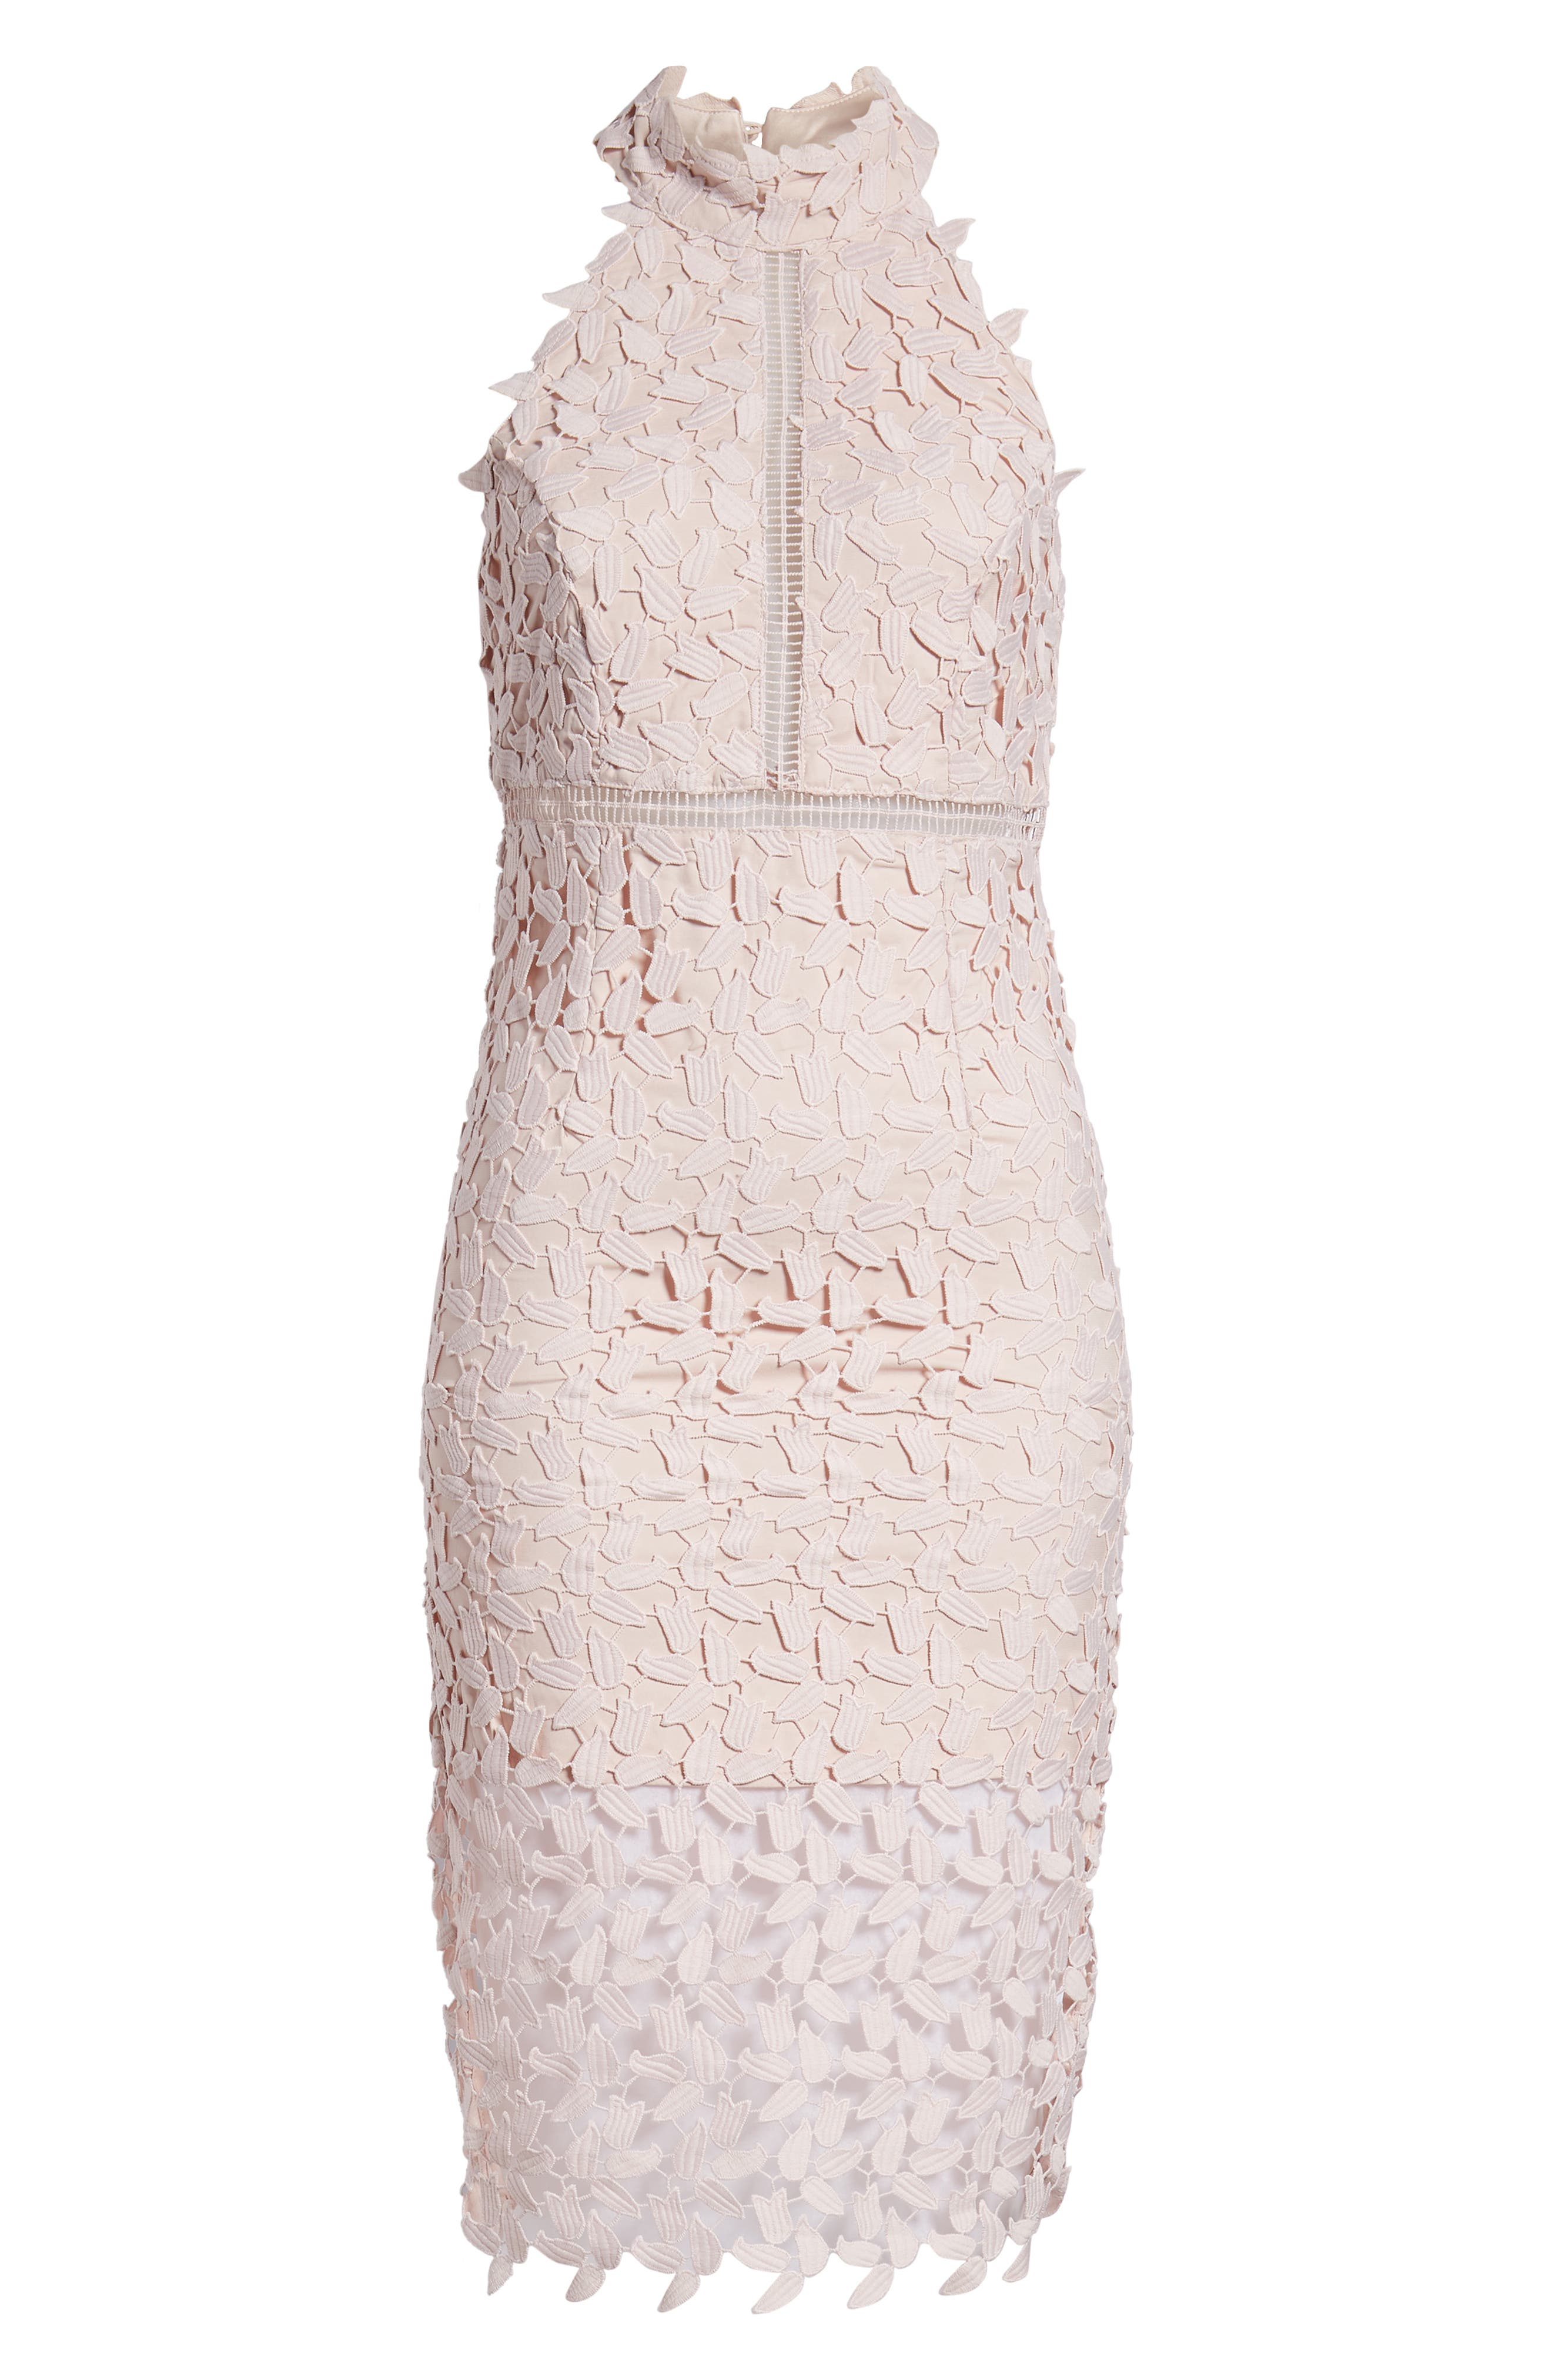 Mychicpicks Bardot Gemma Halter Lace Sheath Dress The